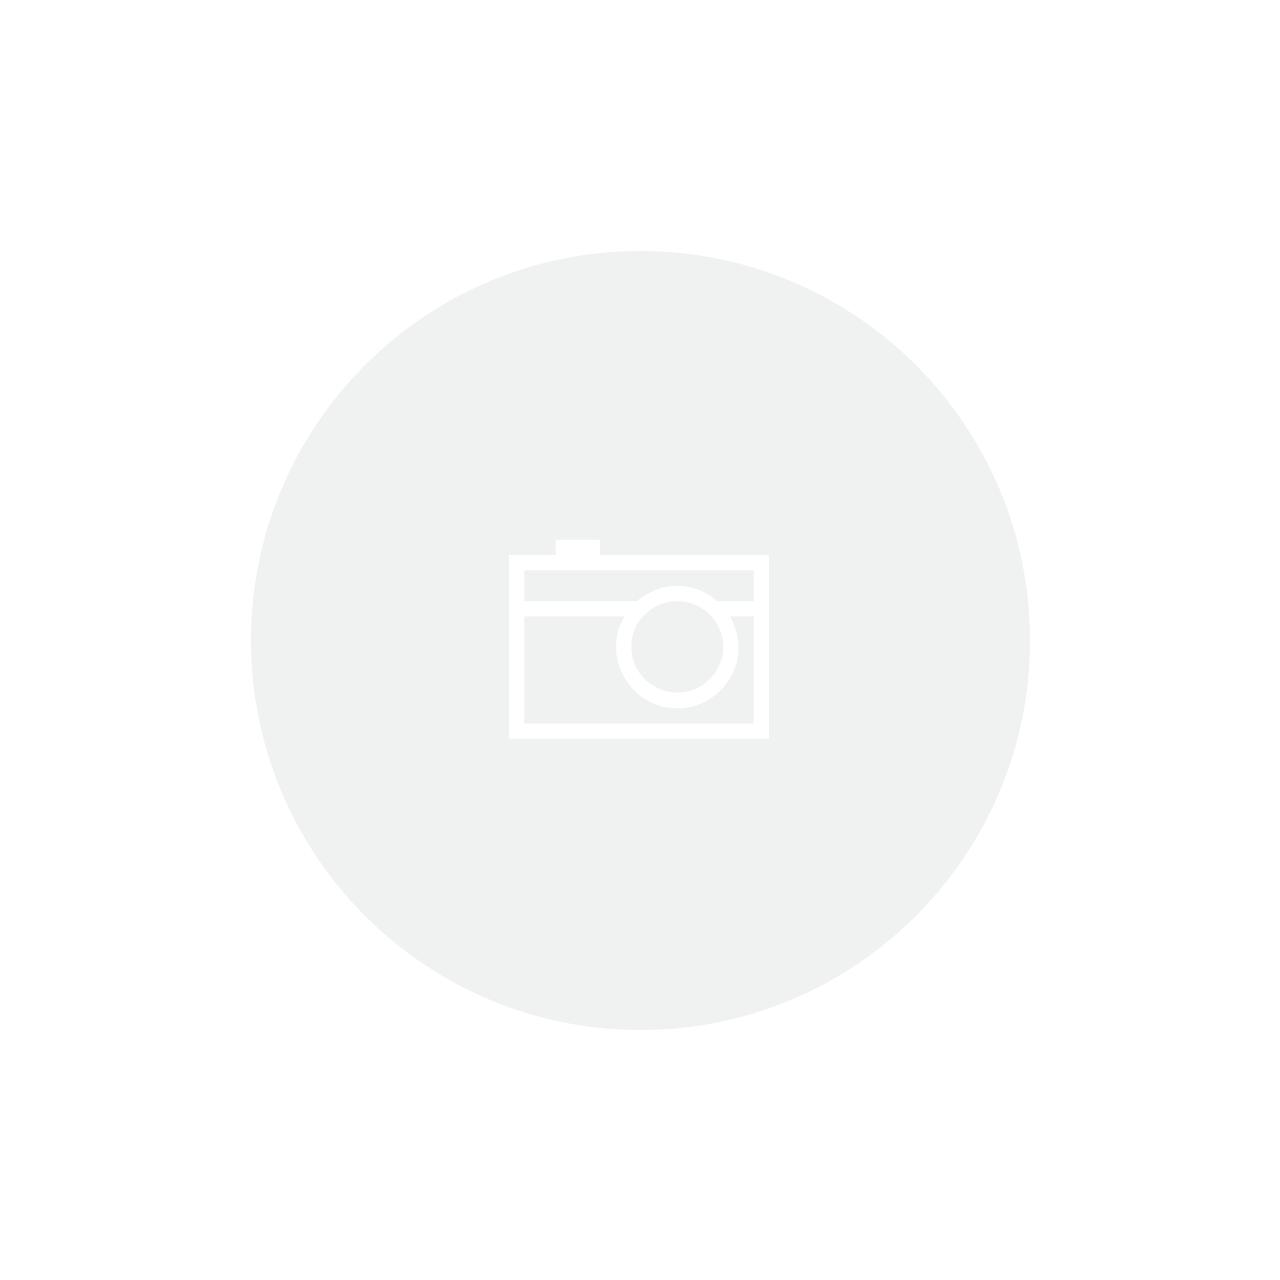 Kit Acessórios de Tosa Profissional Propetz 04 Itens